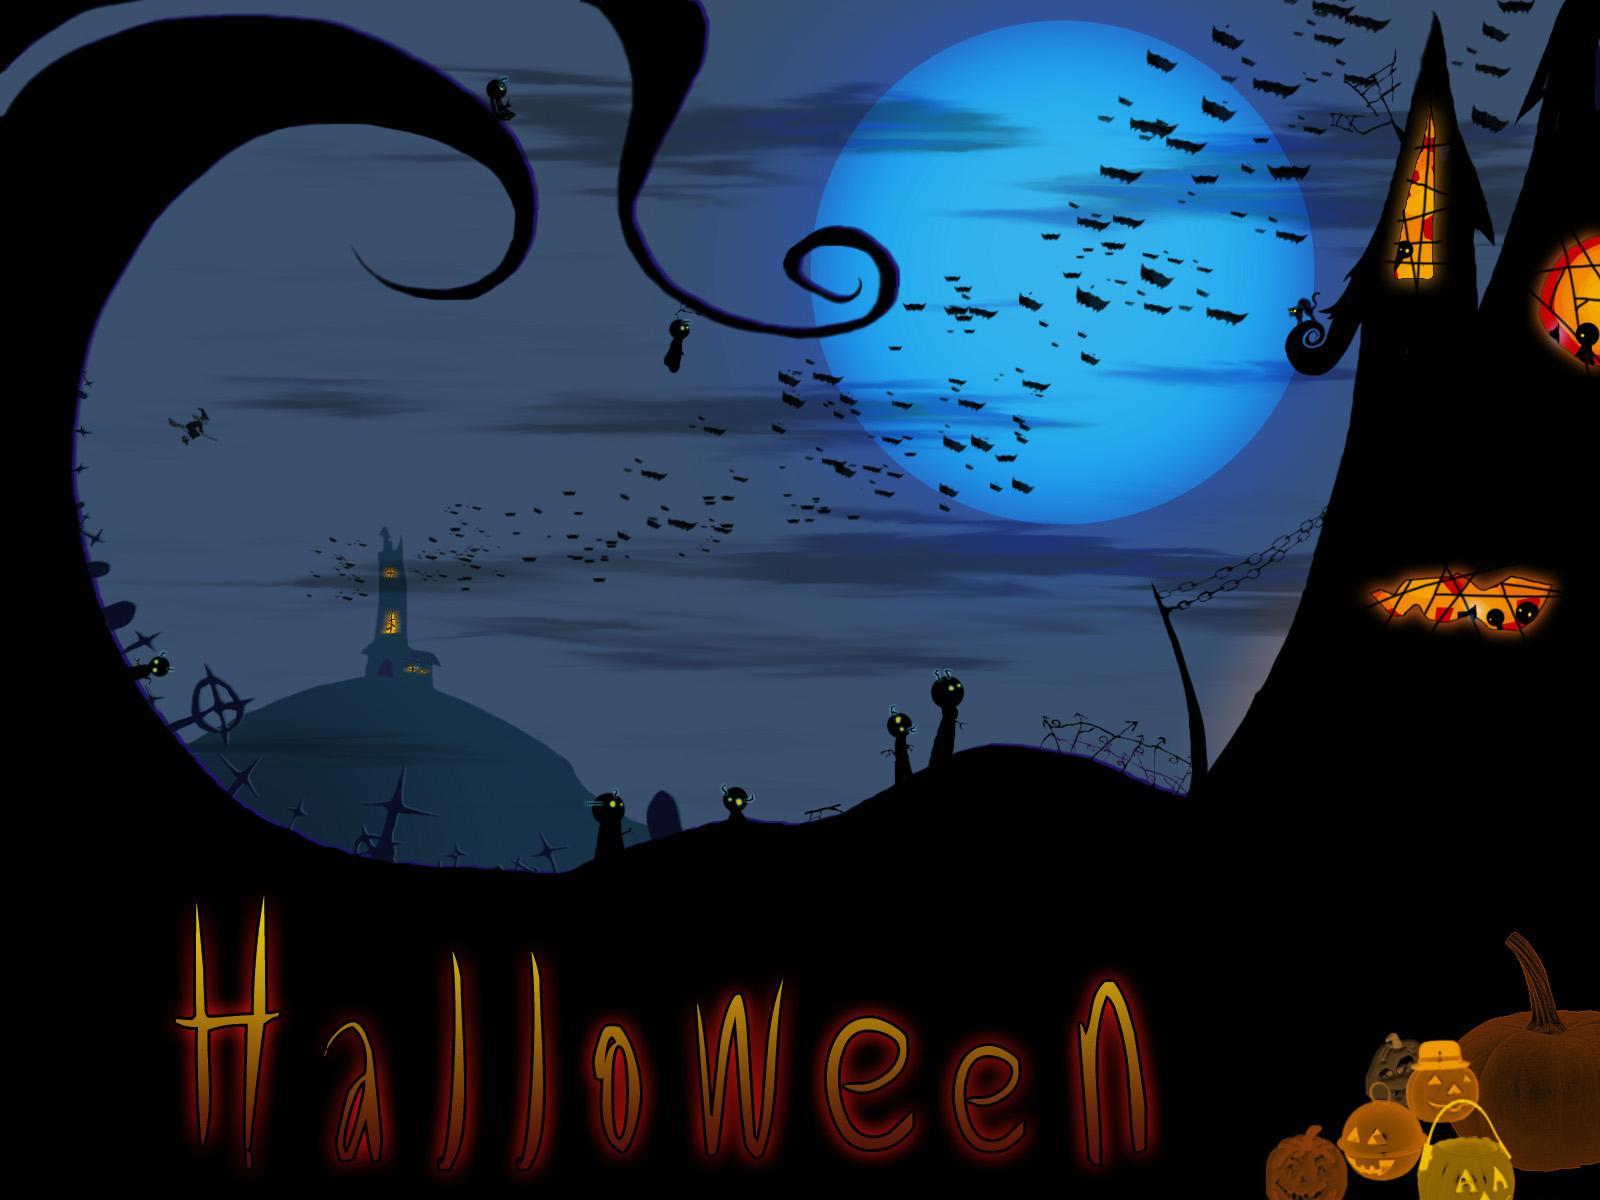 To Halloween Desktop Wallpapers FREE on Latorocom 1600x1200